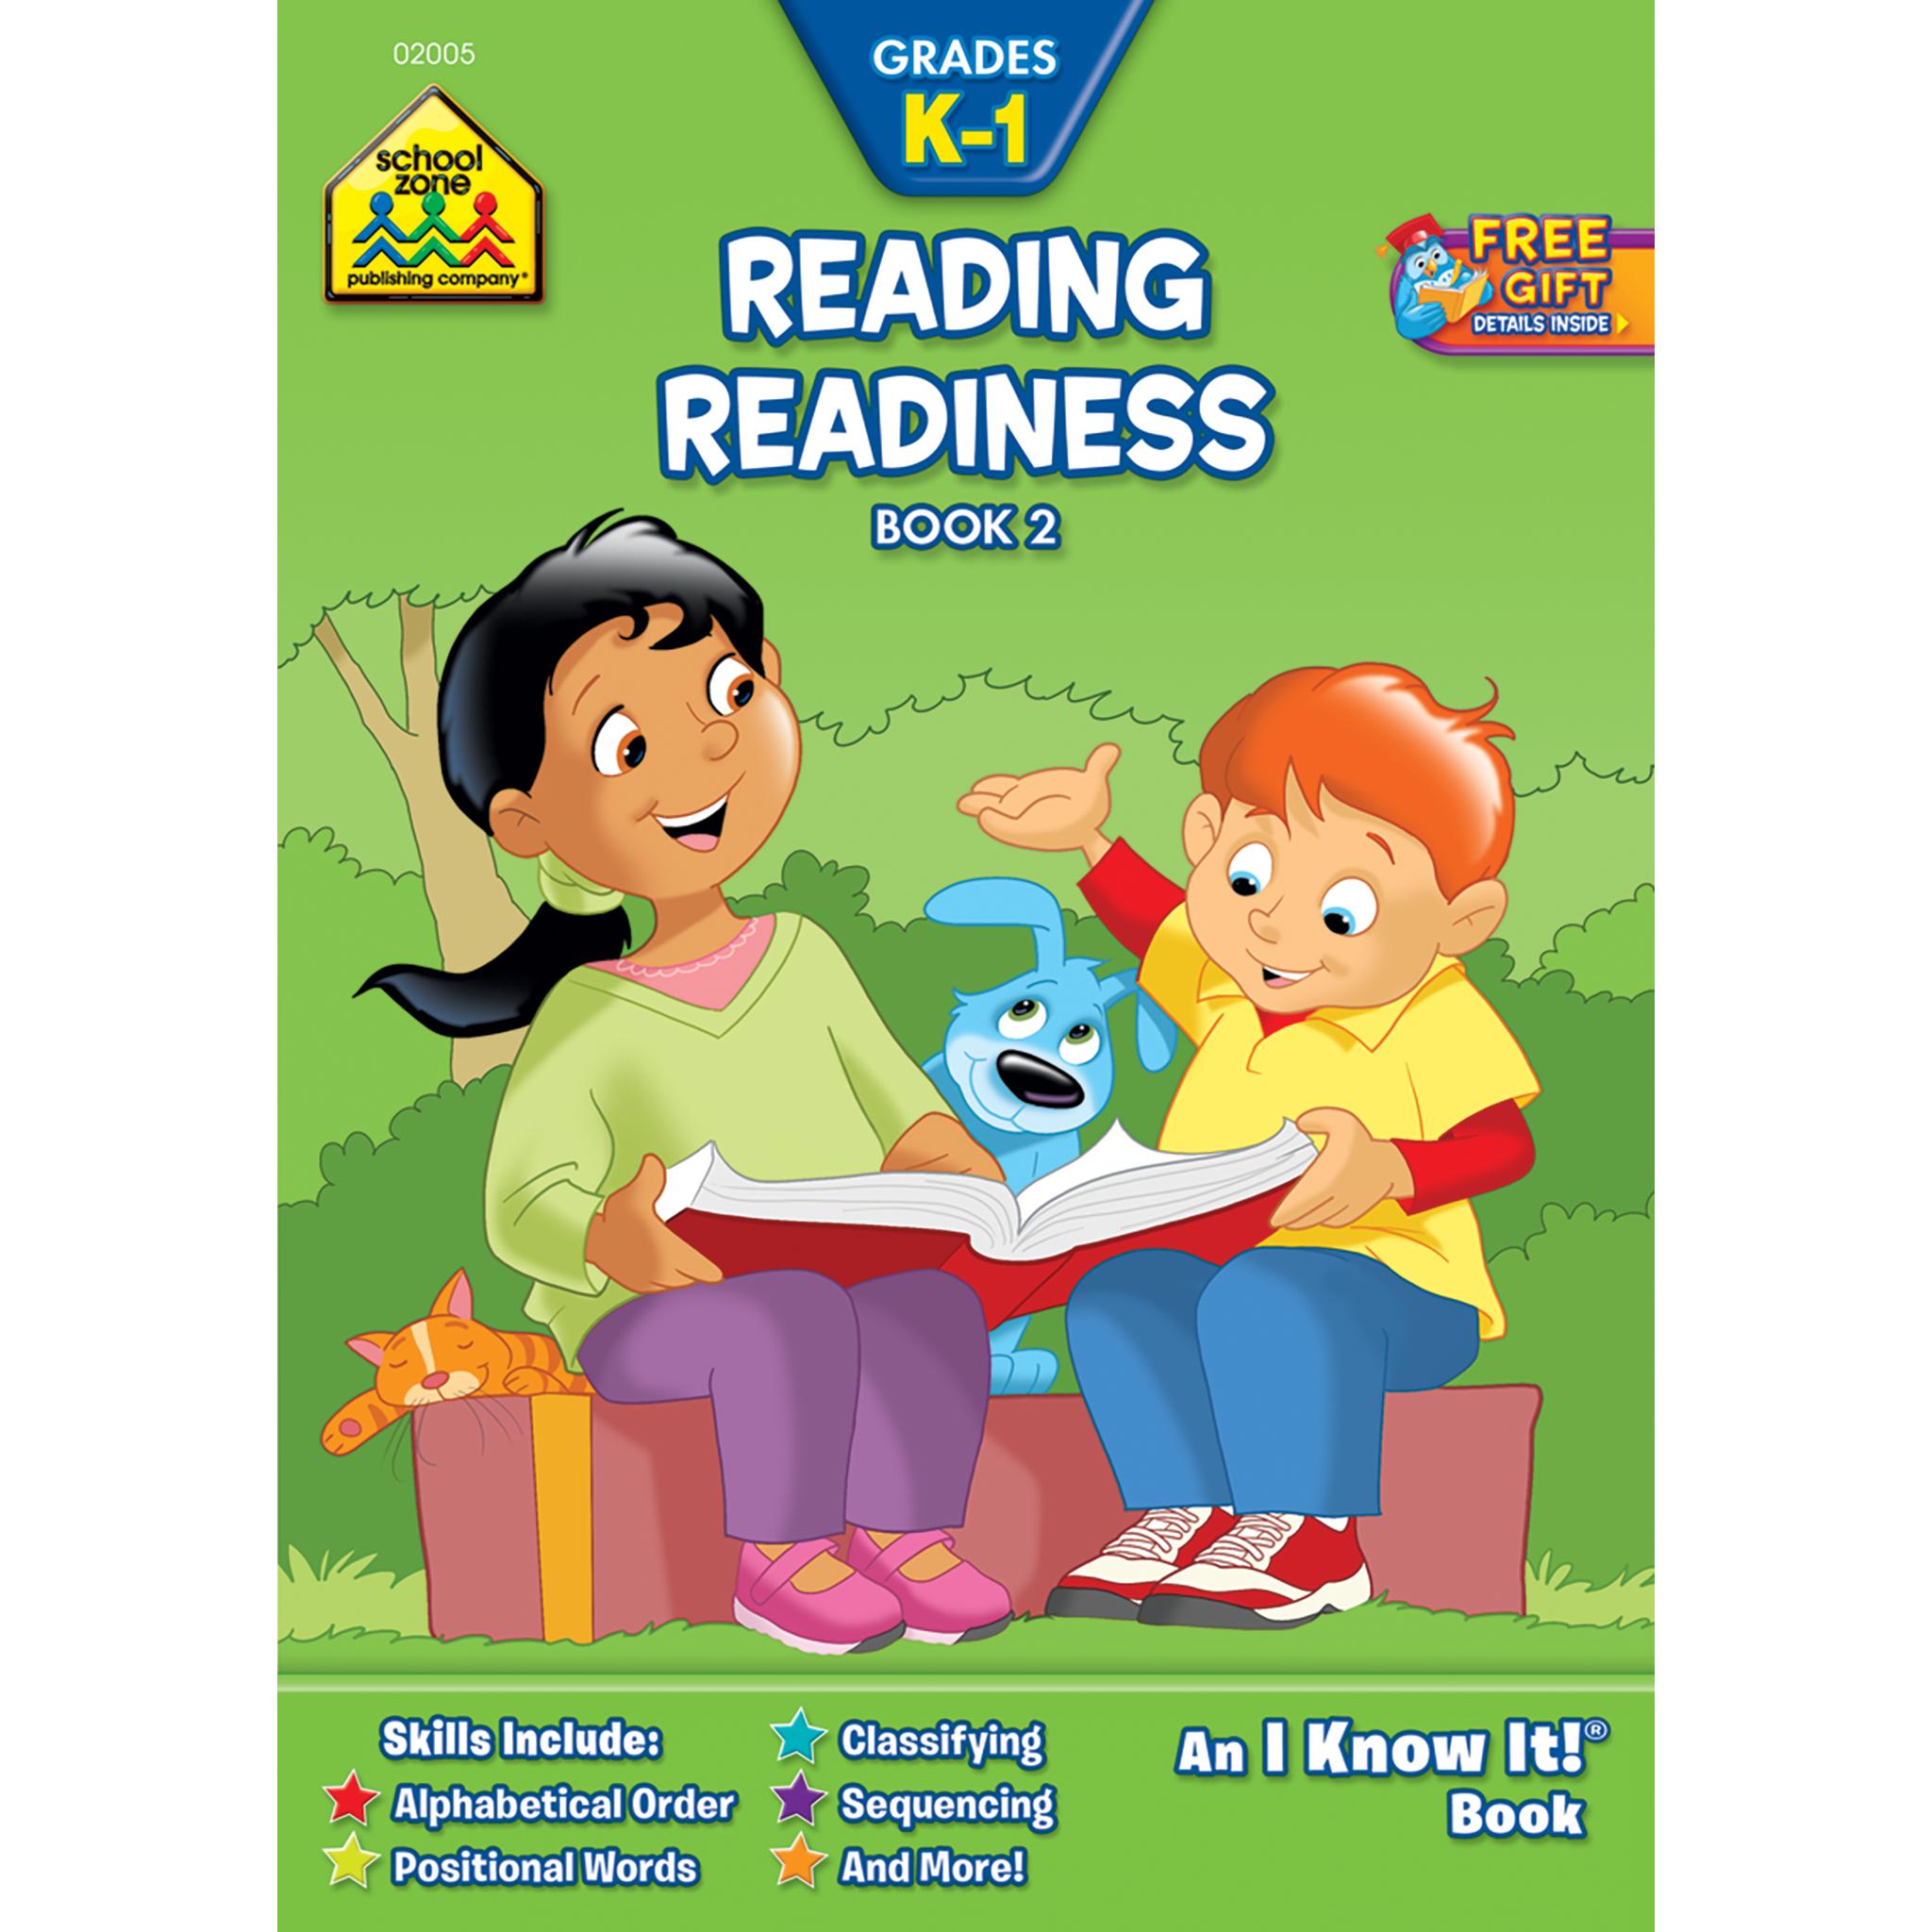 Reading Readiness Grades K 1 Workbook Book 2 Kindergarten Books English Learning Books Teacher Books [ 2048 x 2048 Pixel ]